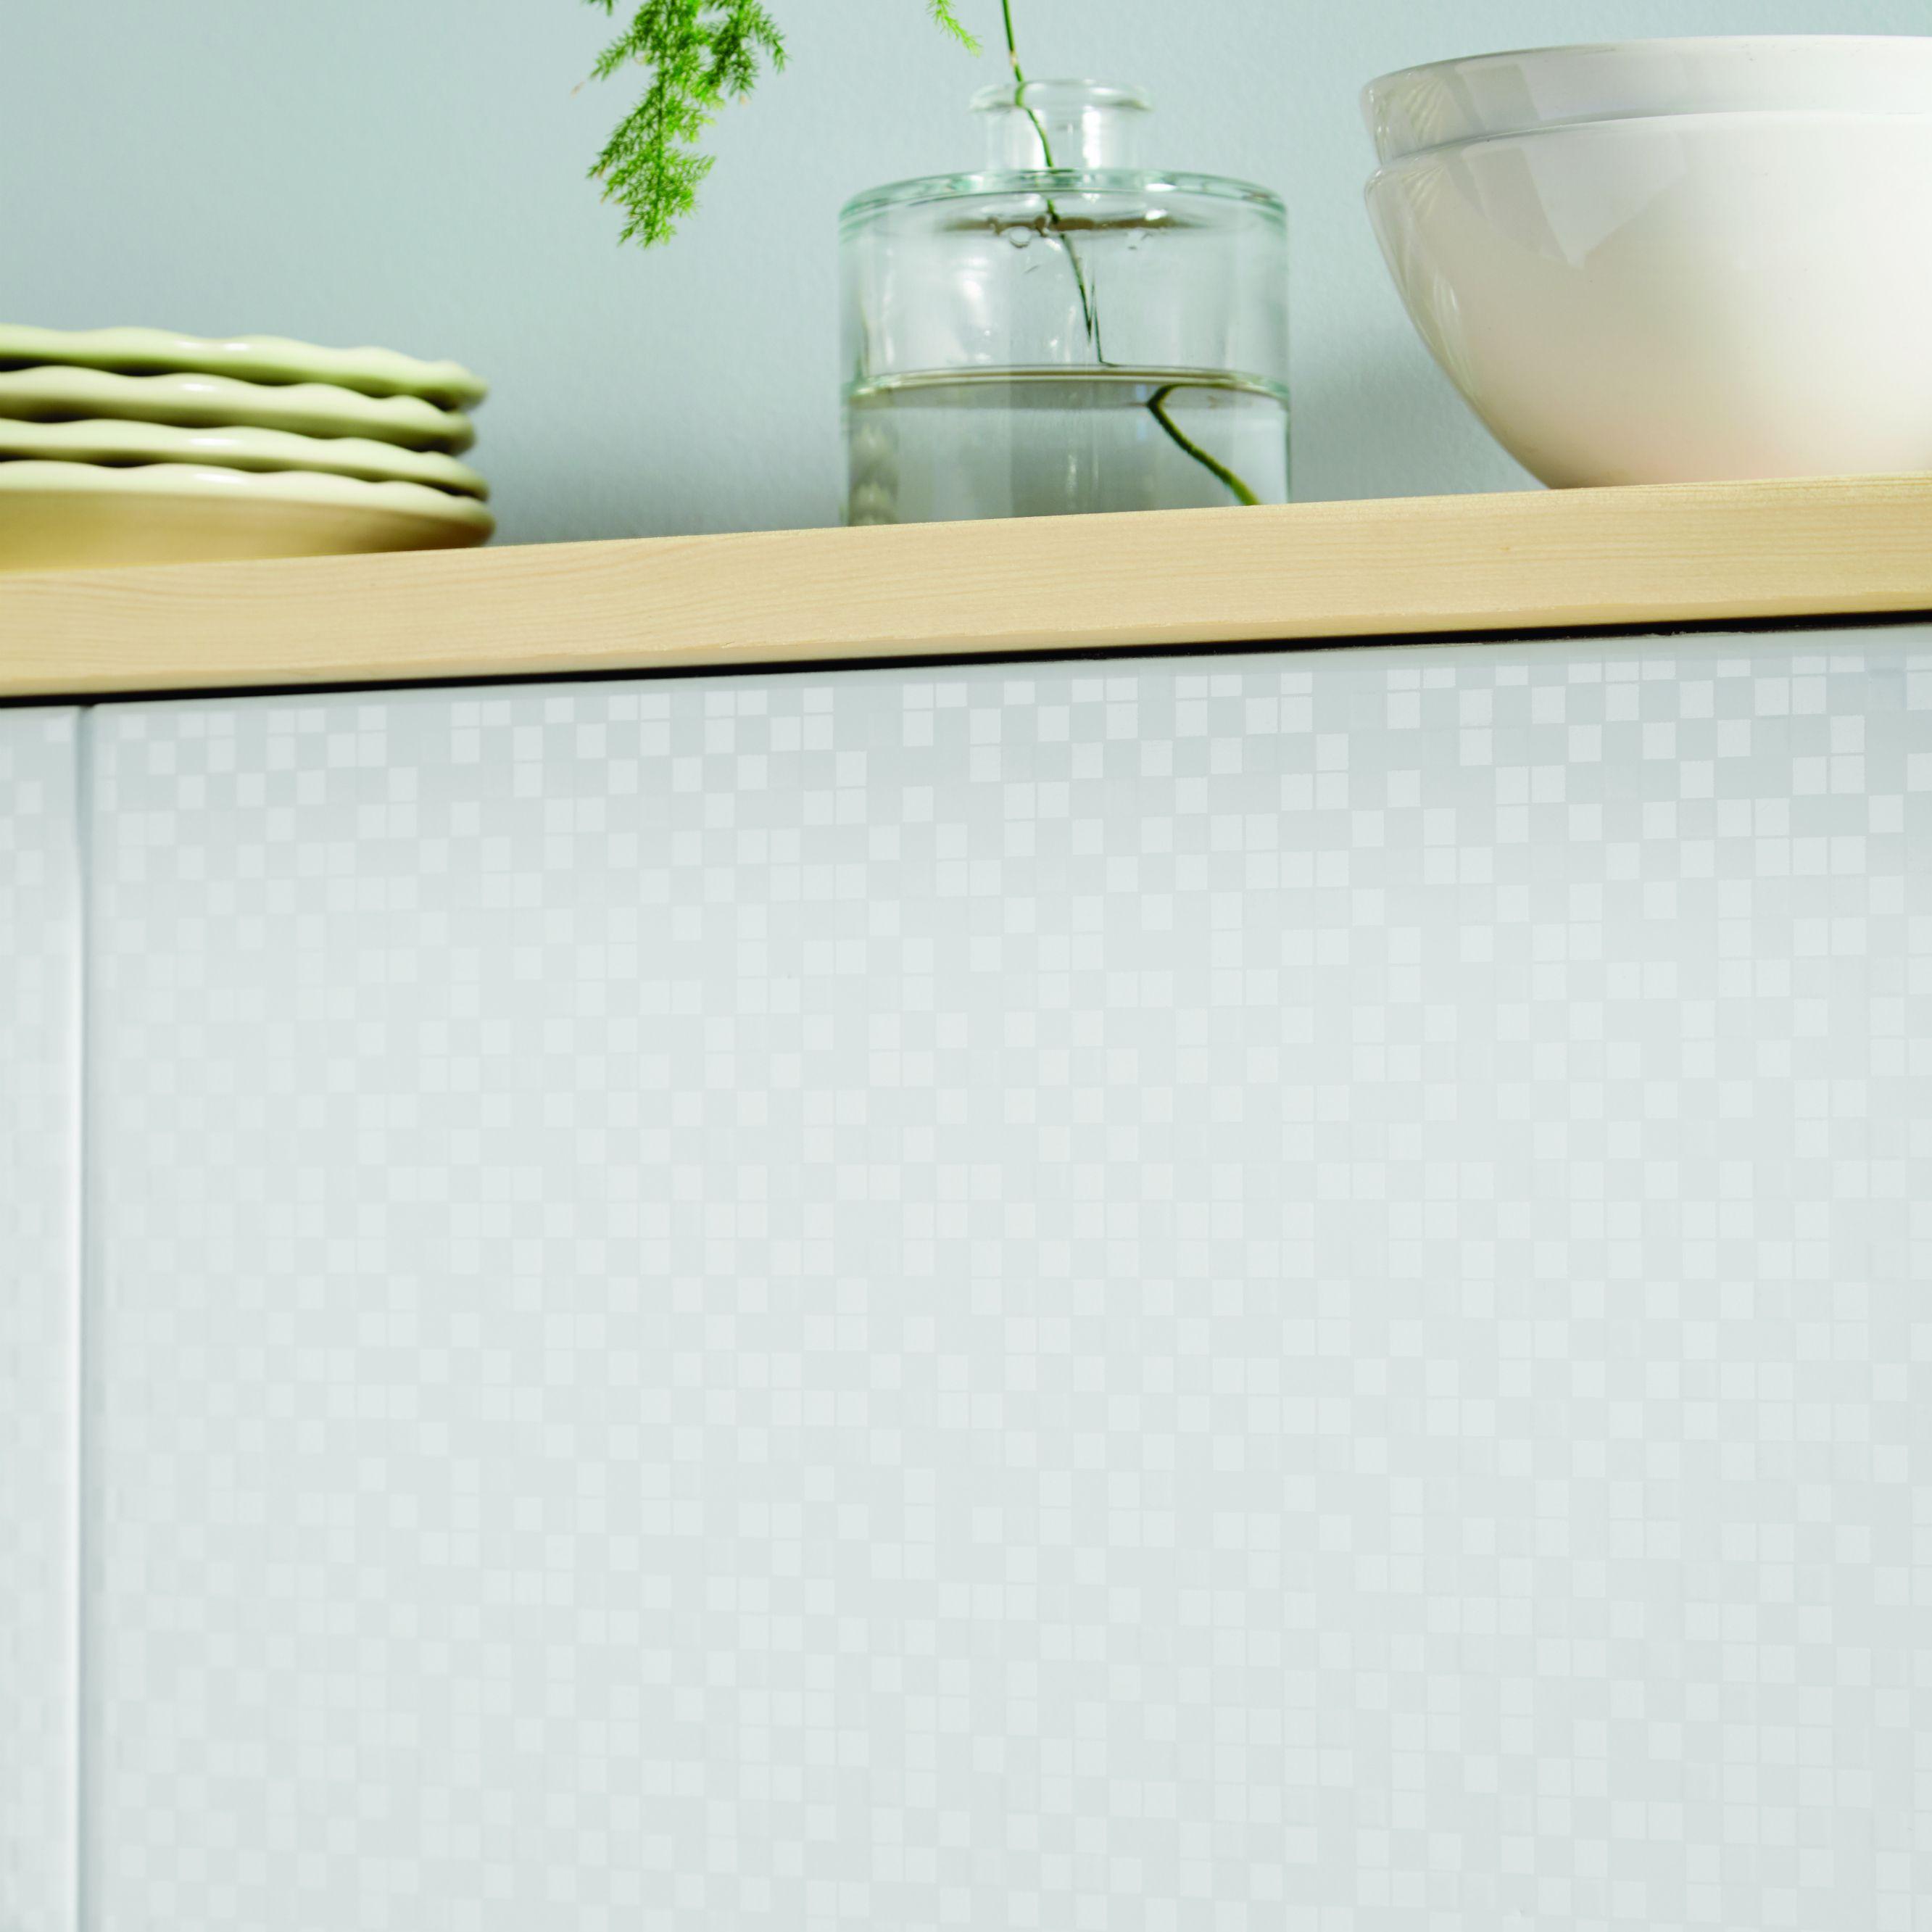 Simplicity tetris Pearl Ceramic Wall tiles, Pack of